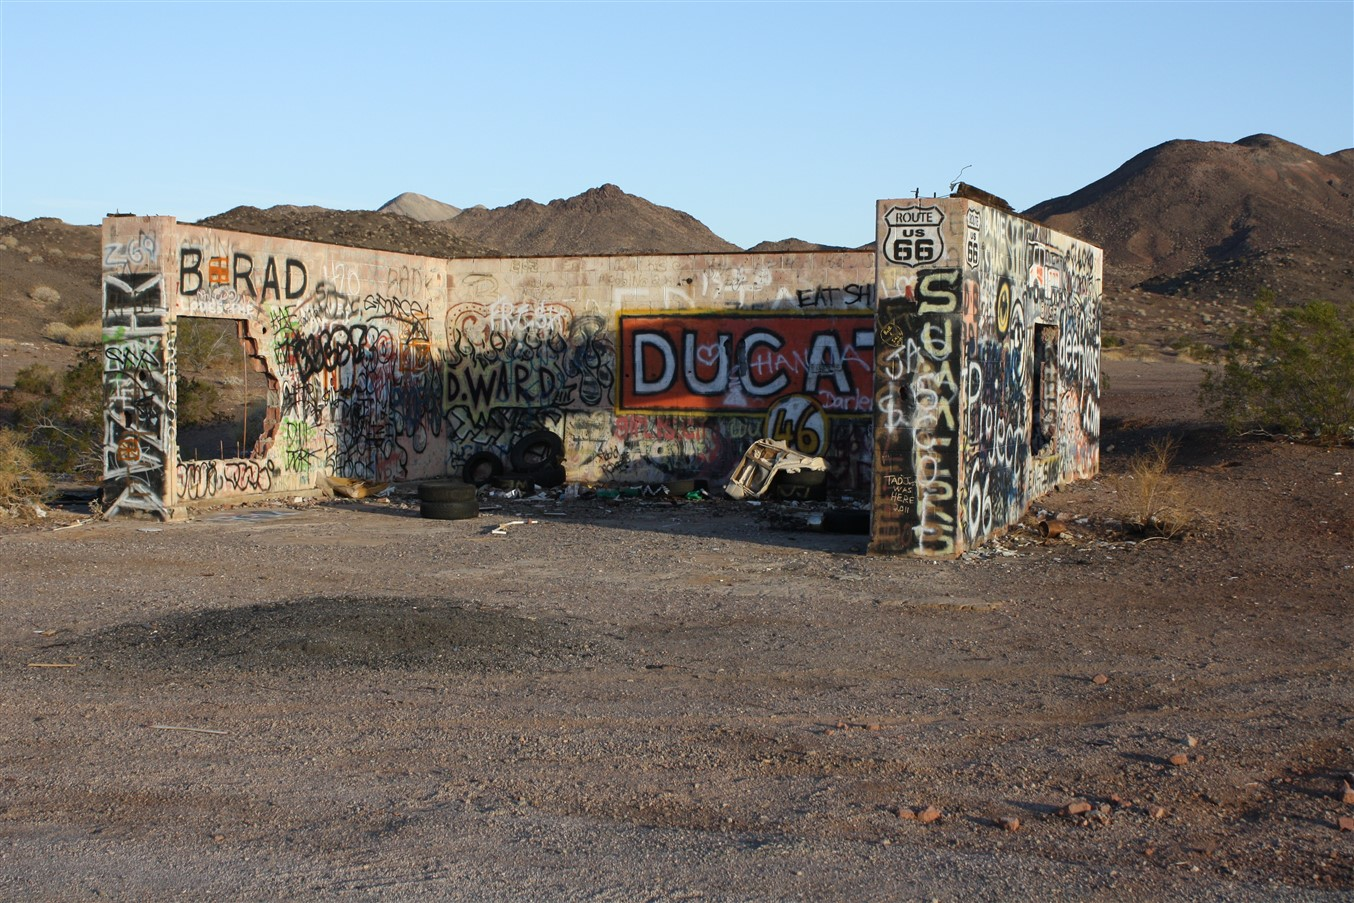 2012 03 14 Route 66 Road Trip 32 California Desert.jpg